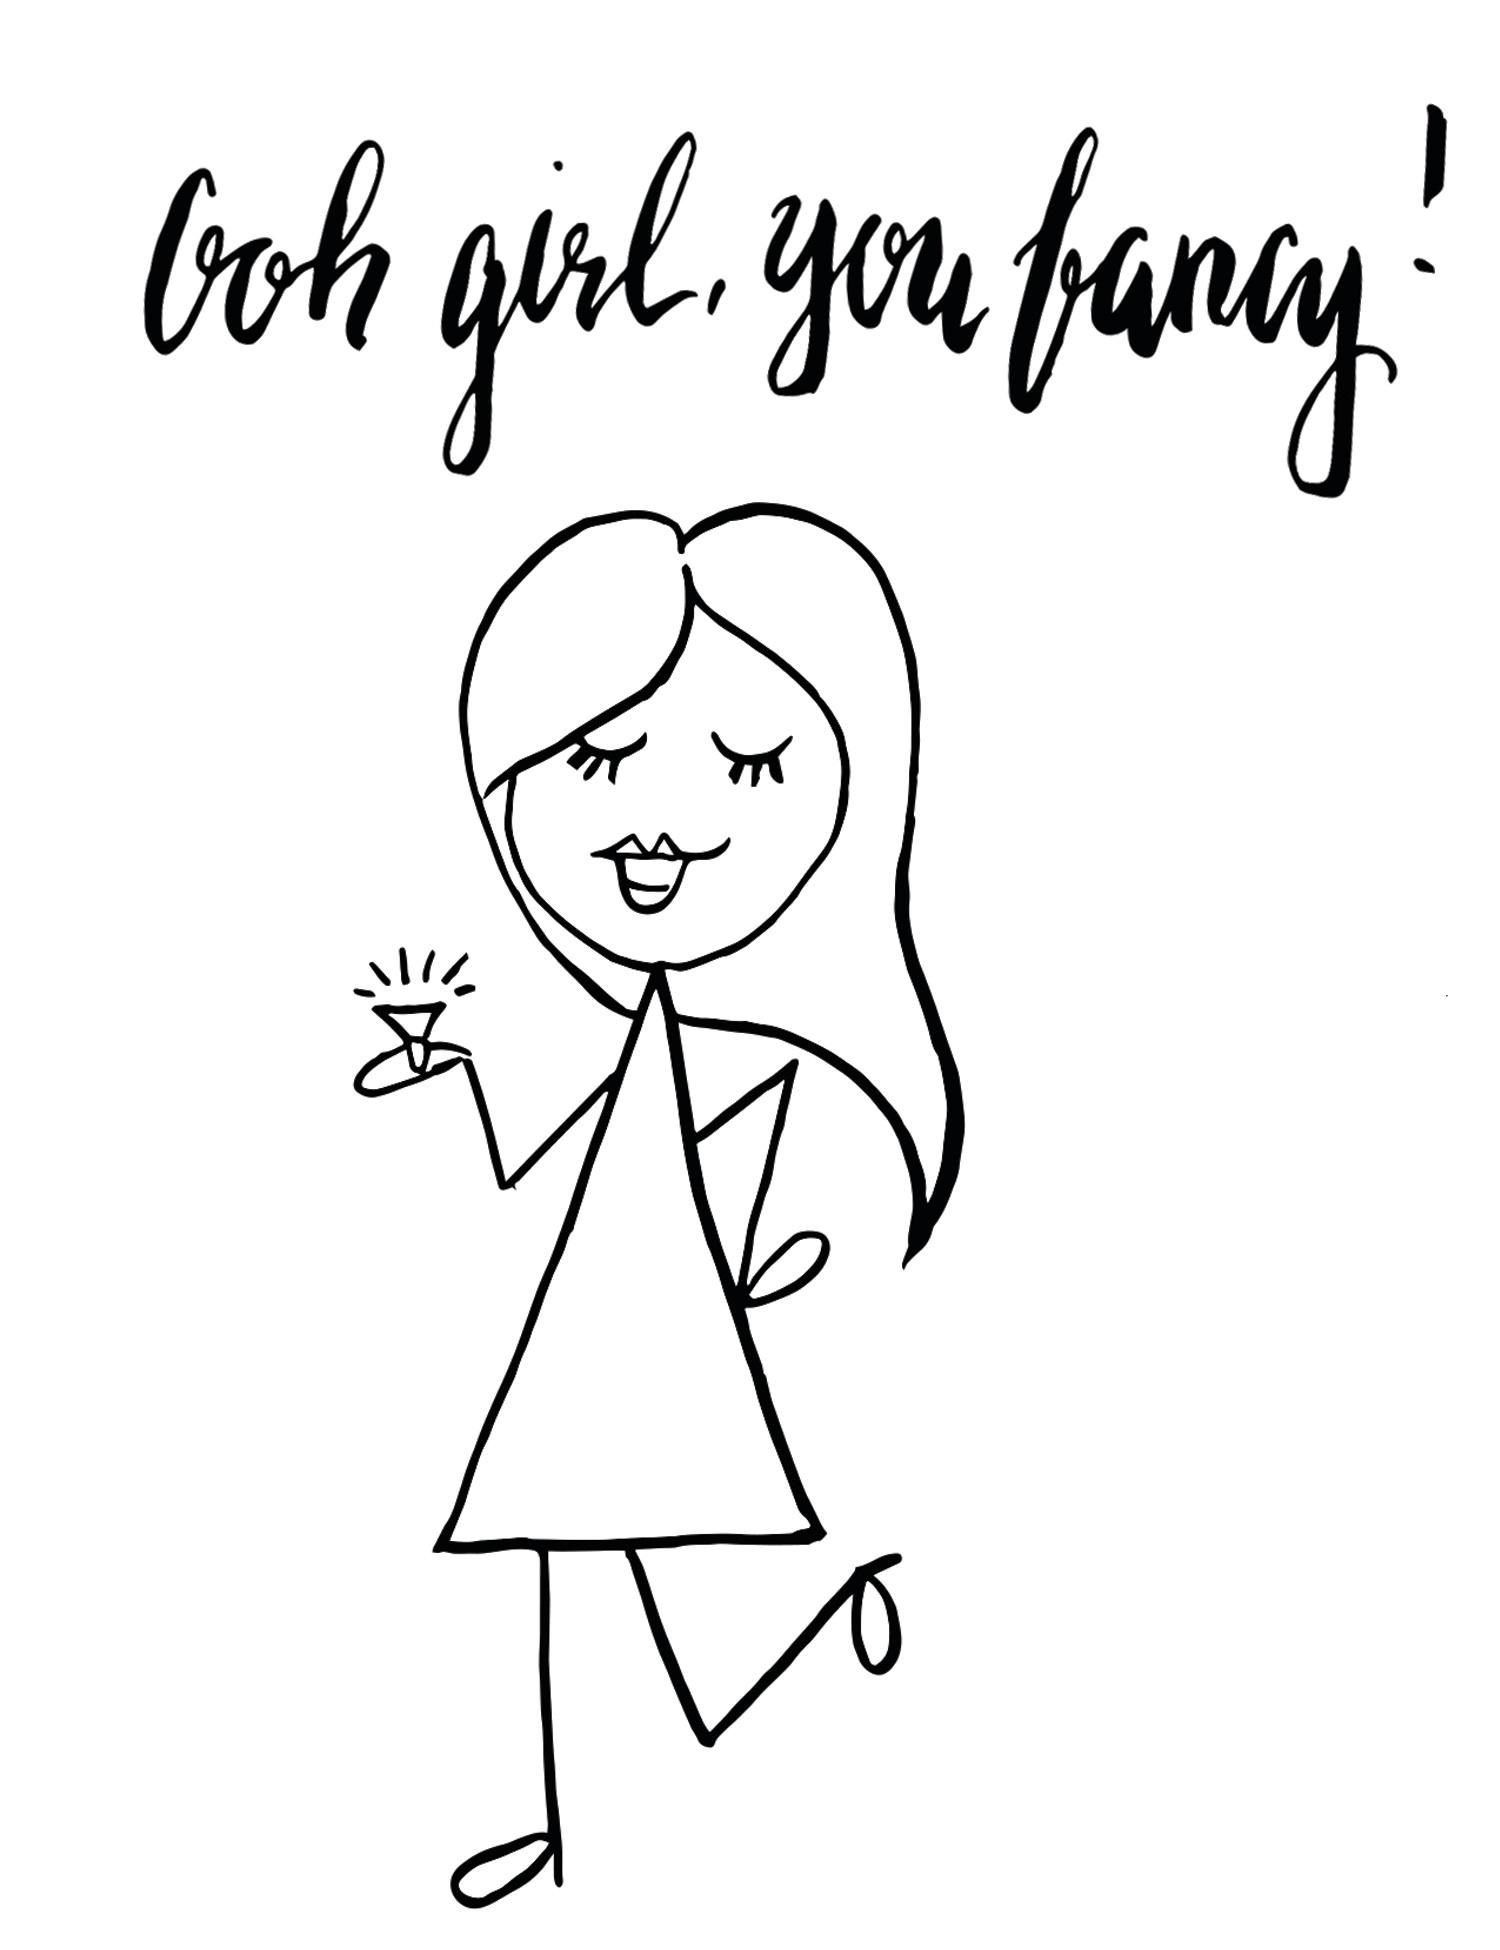 GirlYouFancy 01